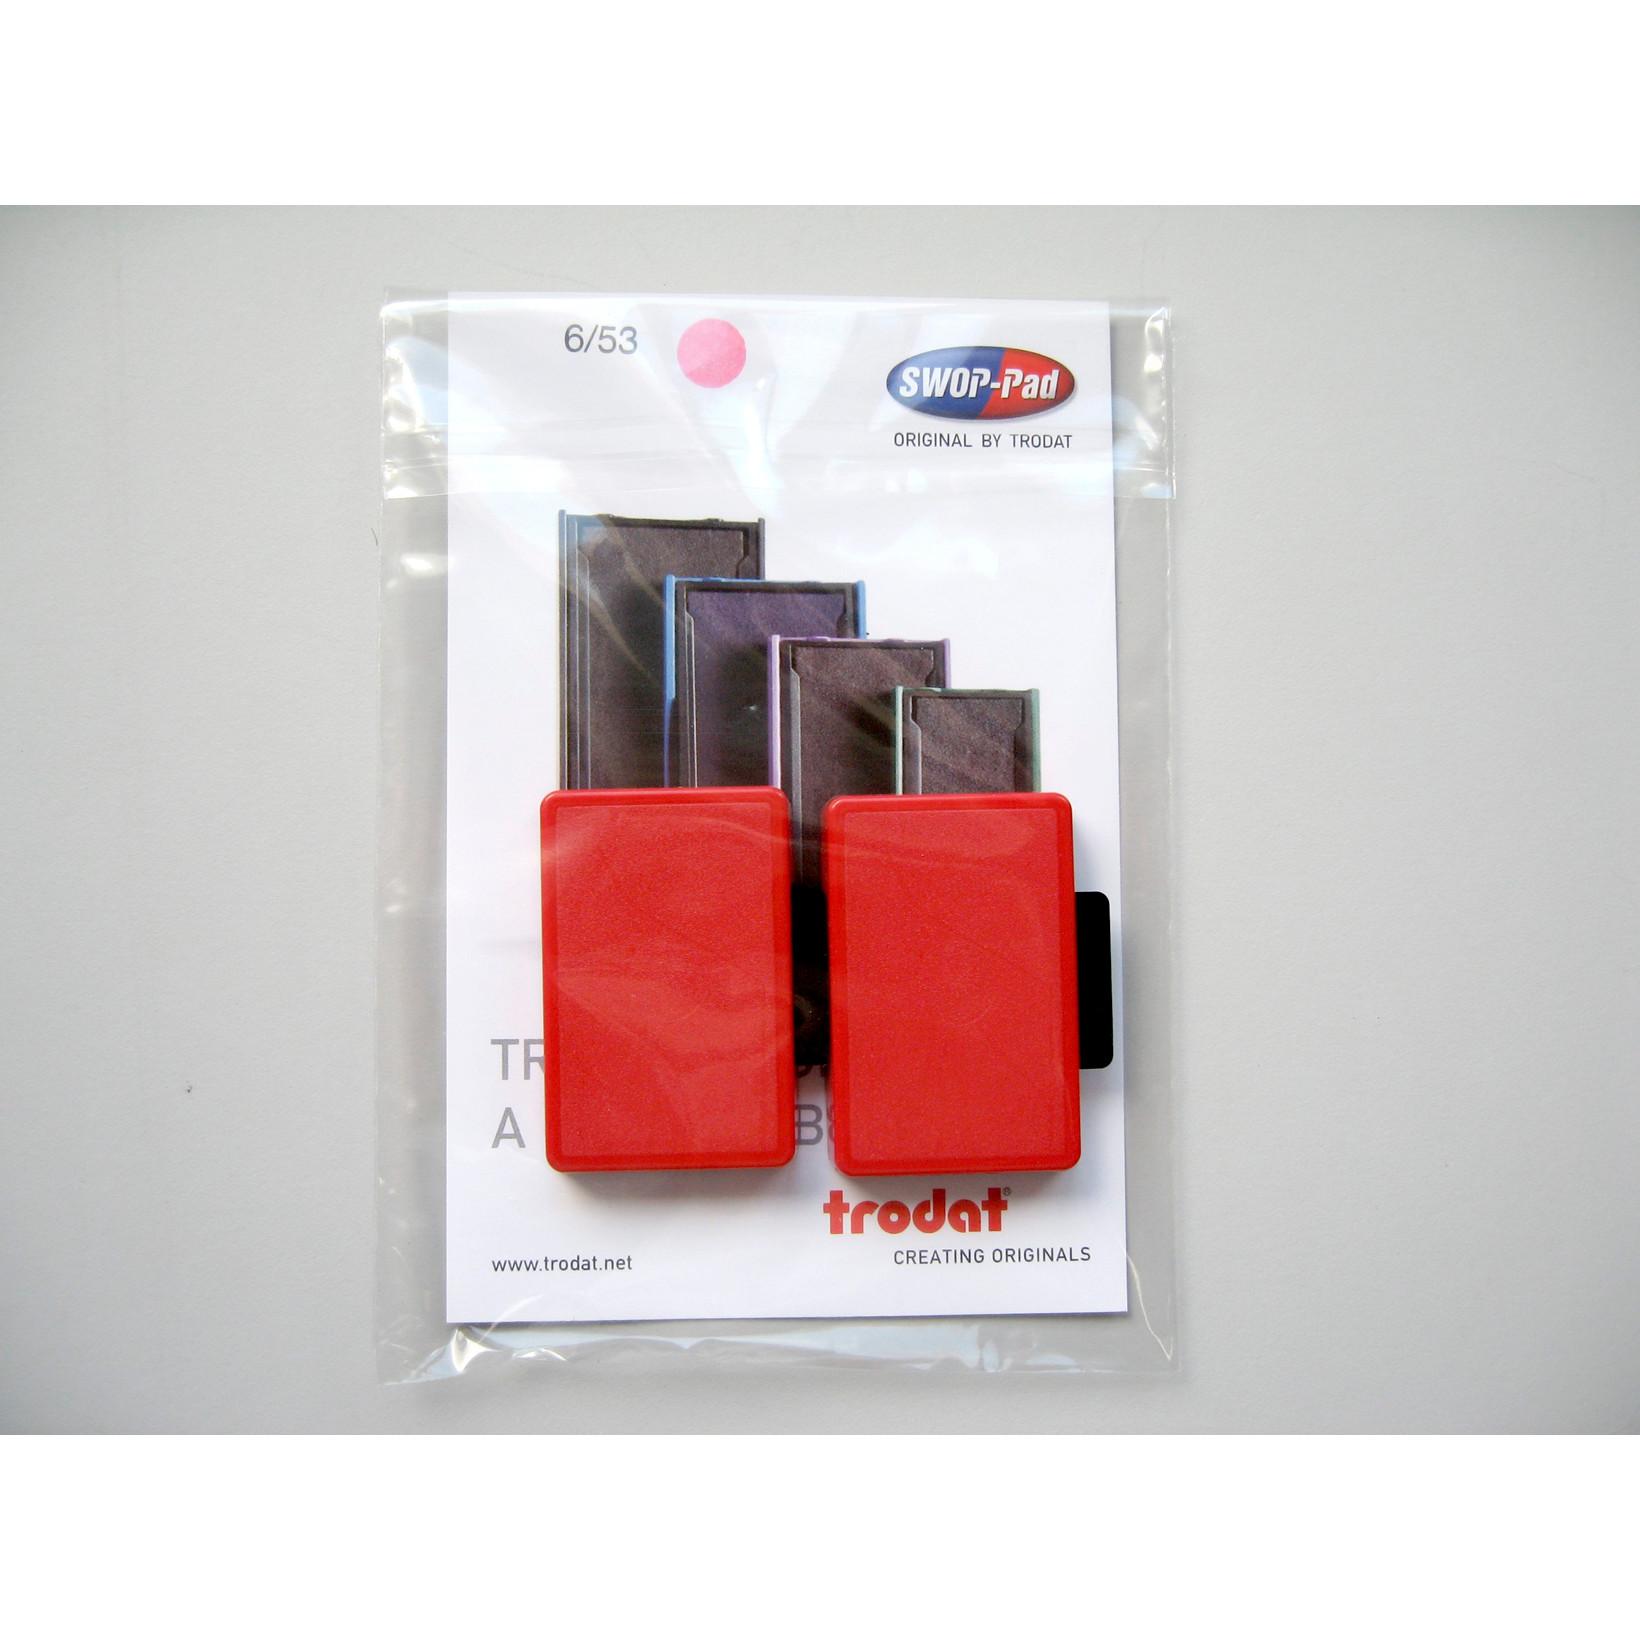 Stempelpude Trodat rød 2-pack 5204,5206,4206,4460 m.fl 6/56